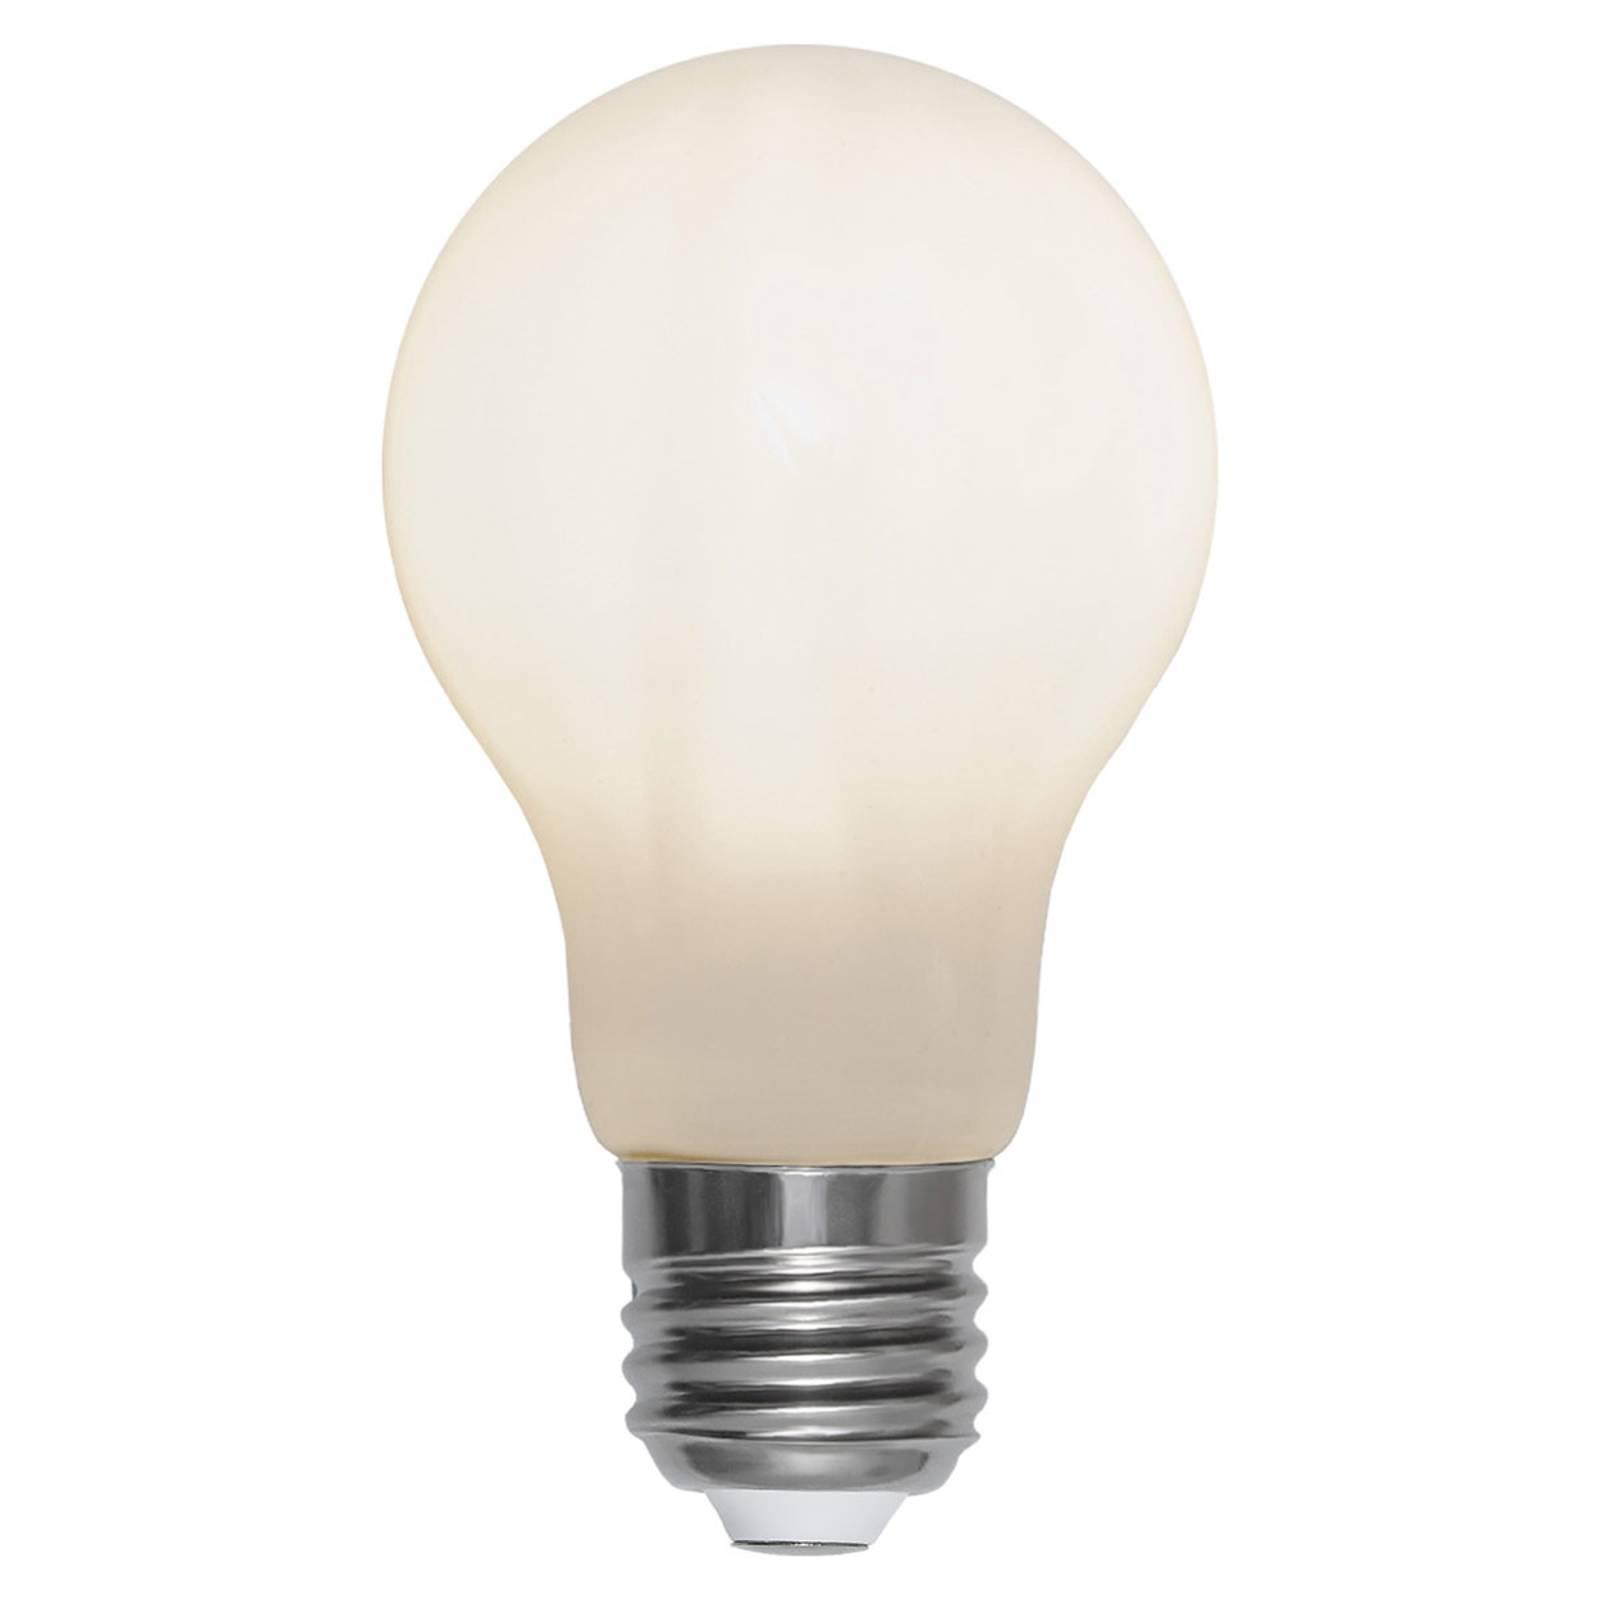 LED-lamppu E27 2 700 K Ra90 opaali 10W